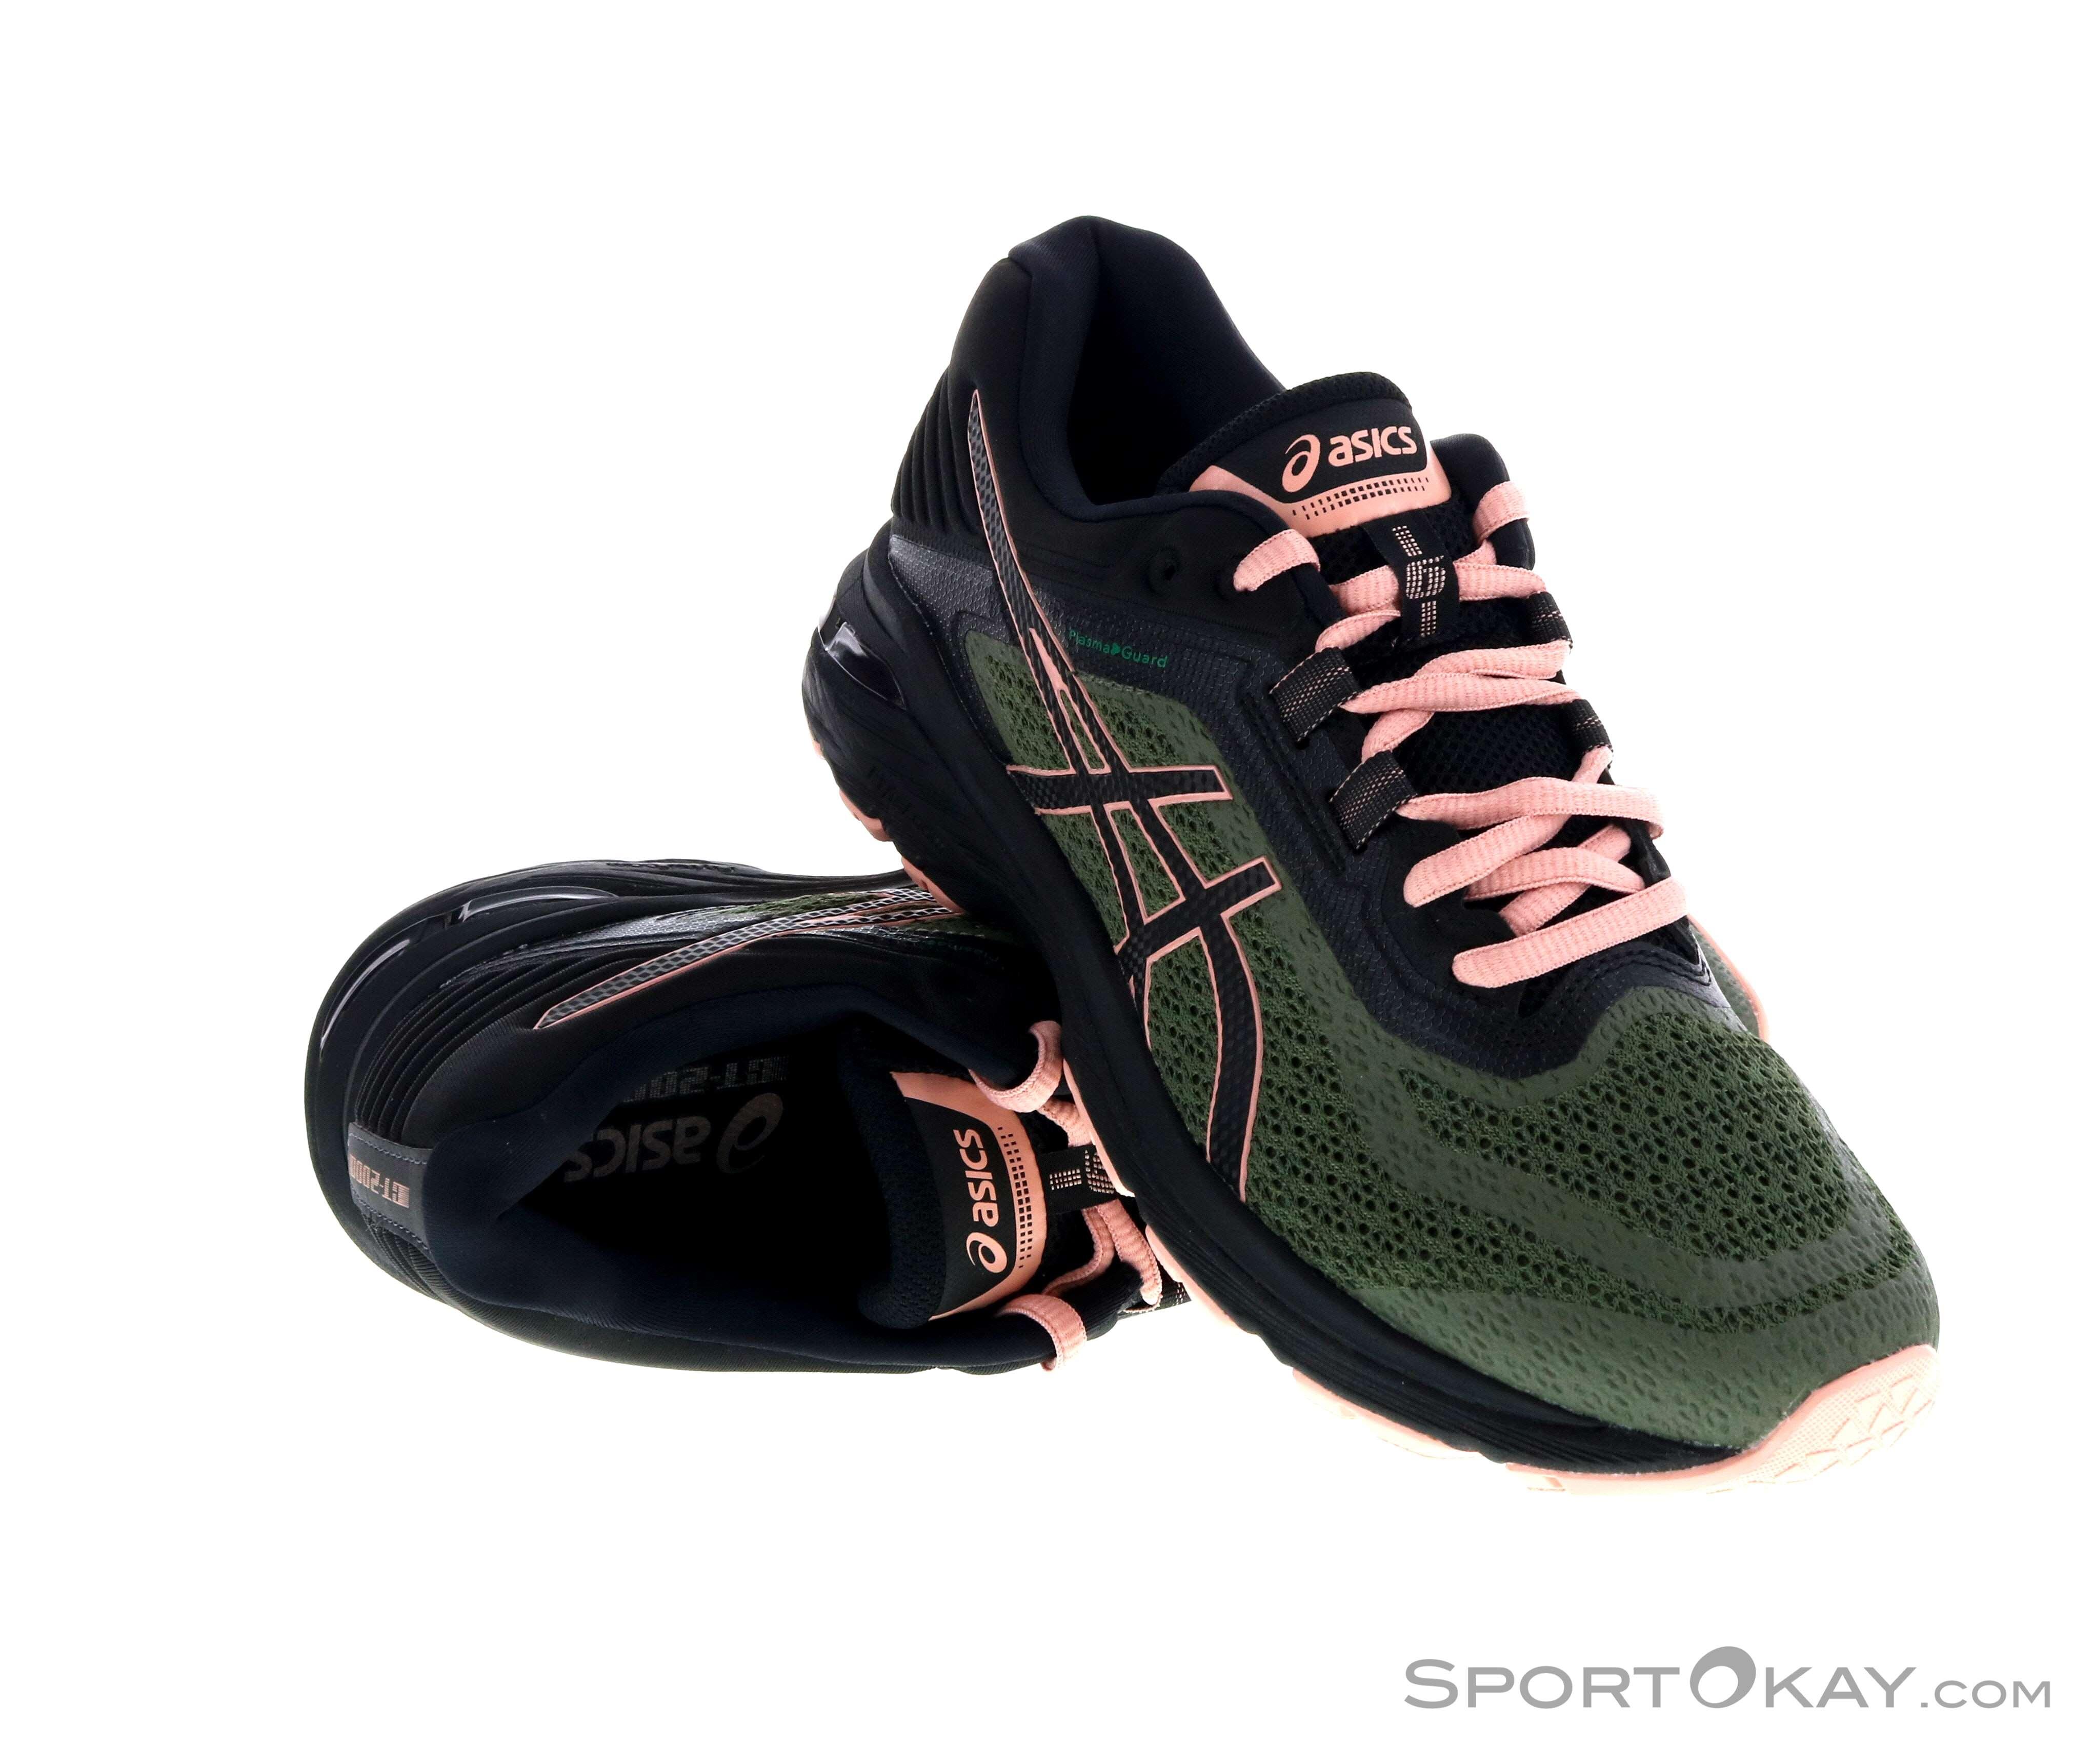 Asics GT-2000 6 Trail Damen Traillaufschuhe-Schwarz-9